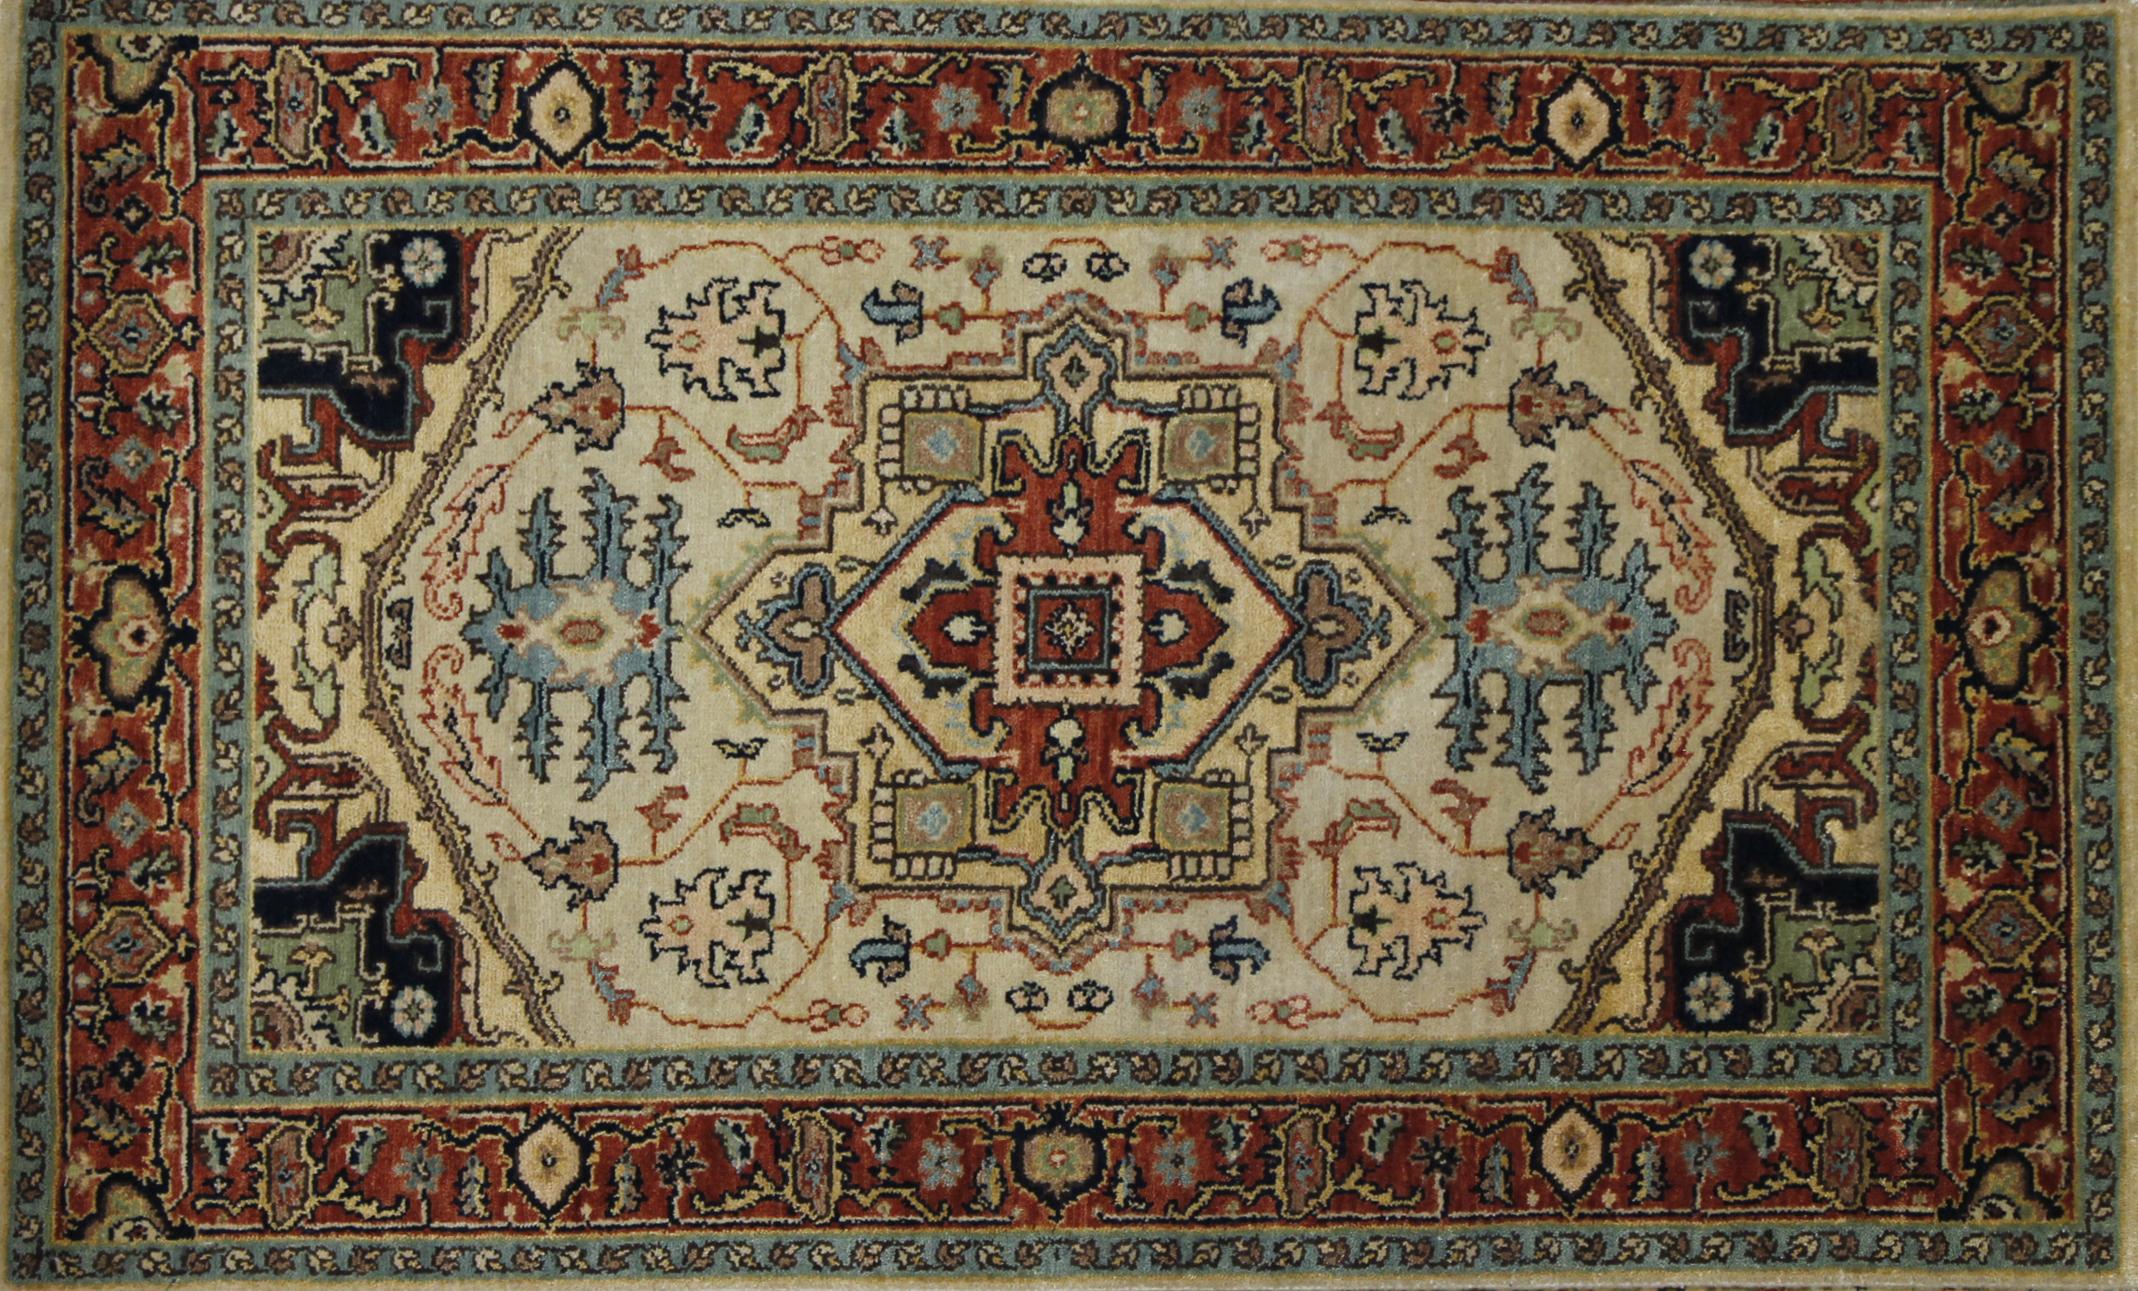 3x5 Heriz/Serapi Hand Knotted Wool Area Rug - MR022675